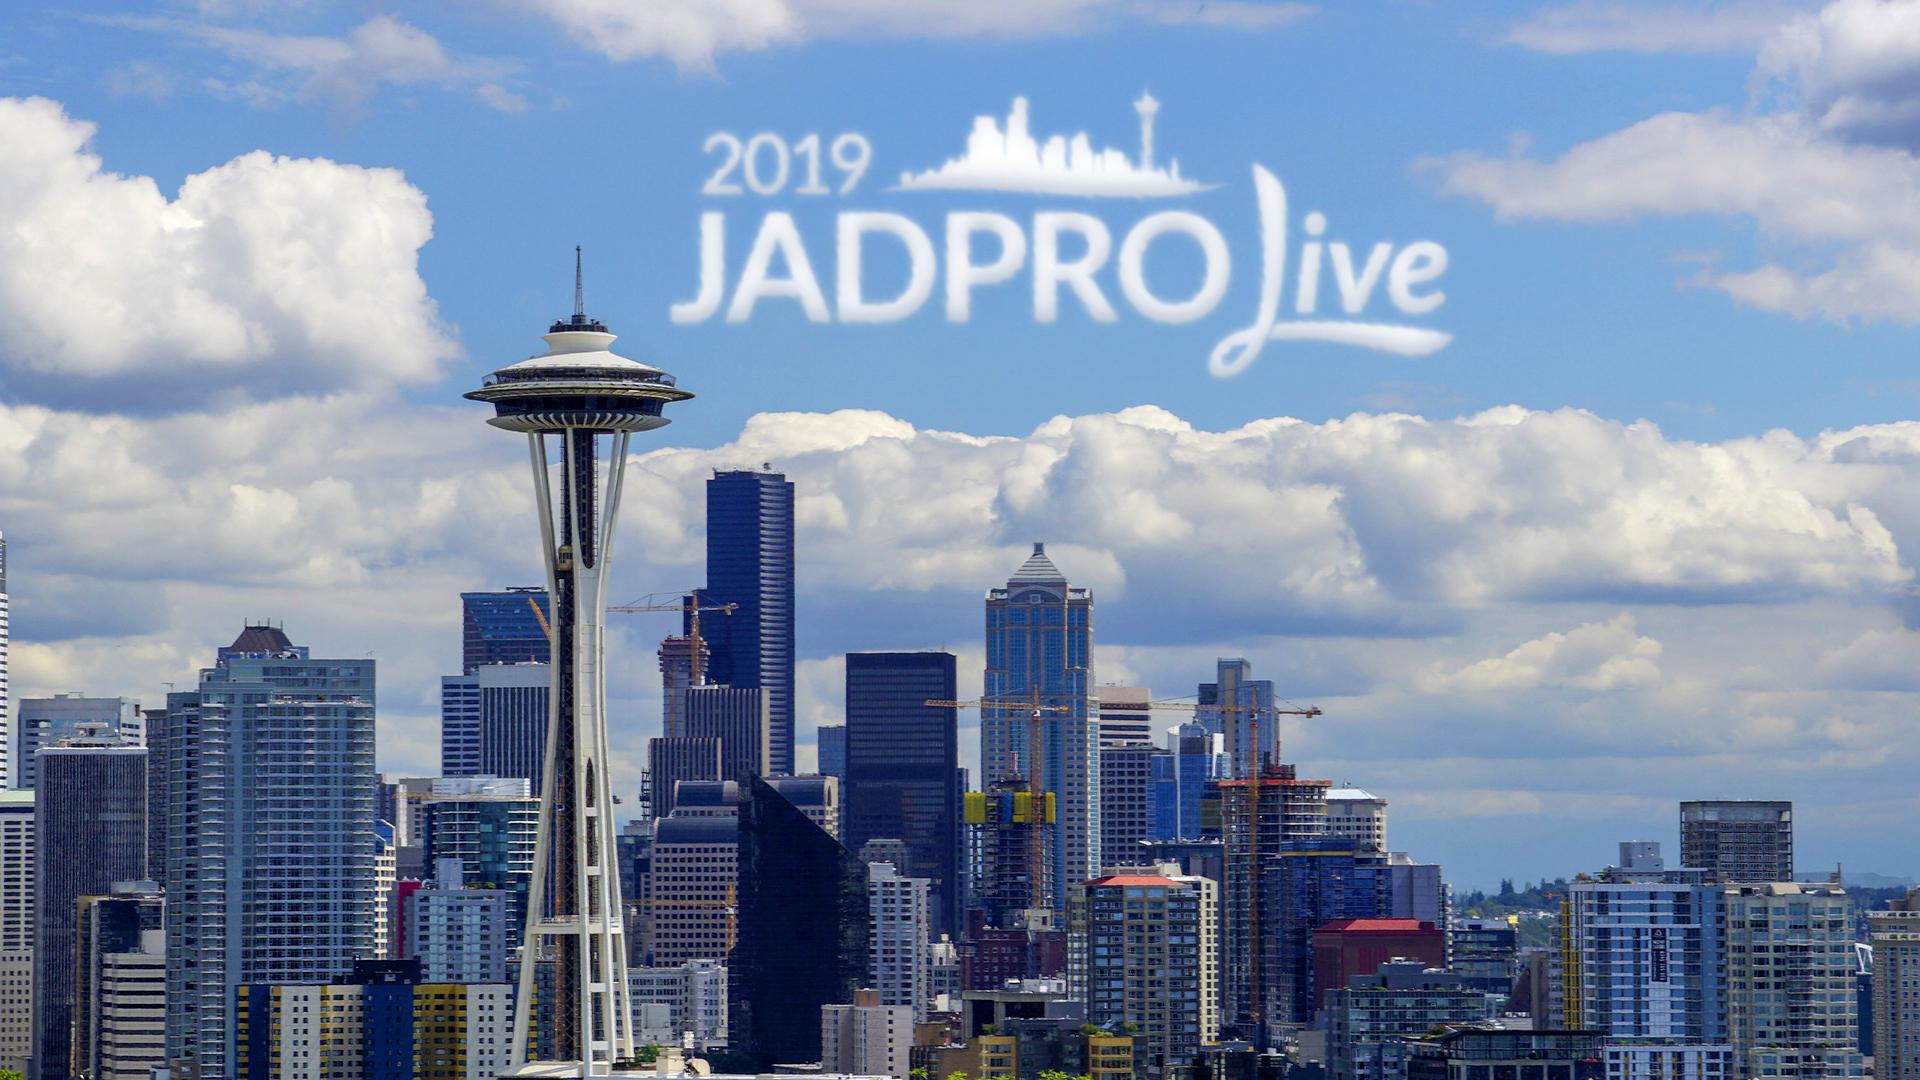 JADPRO Live 2019